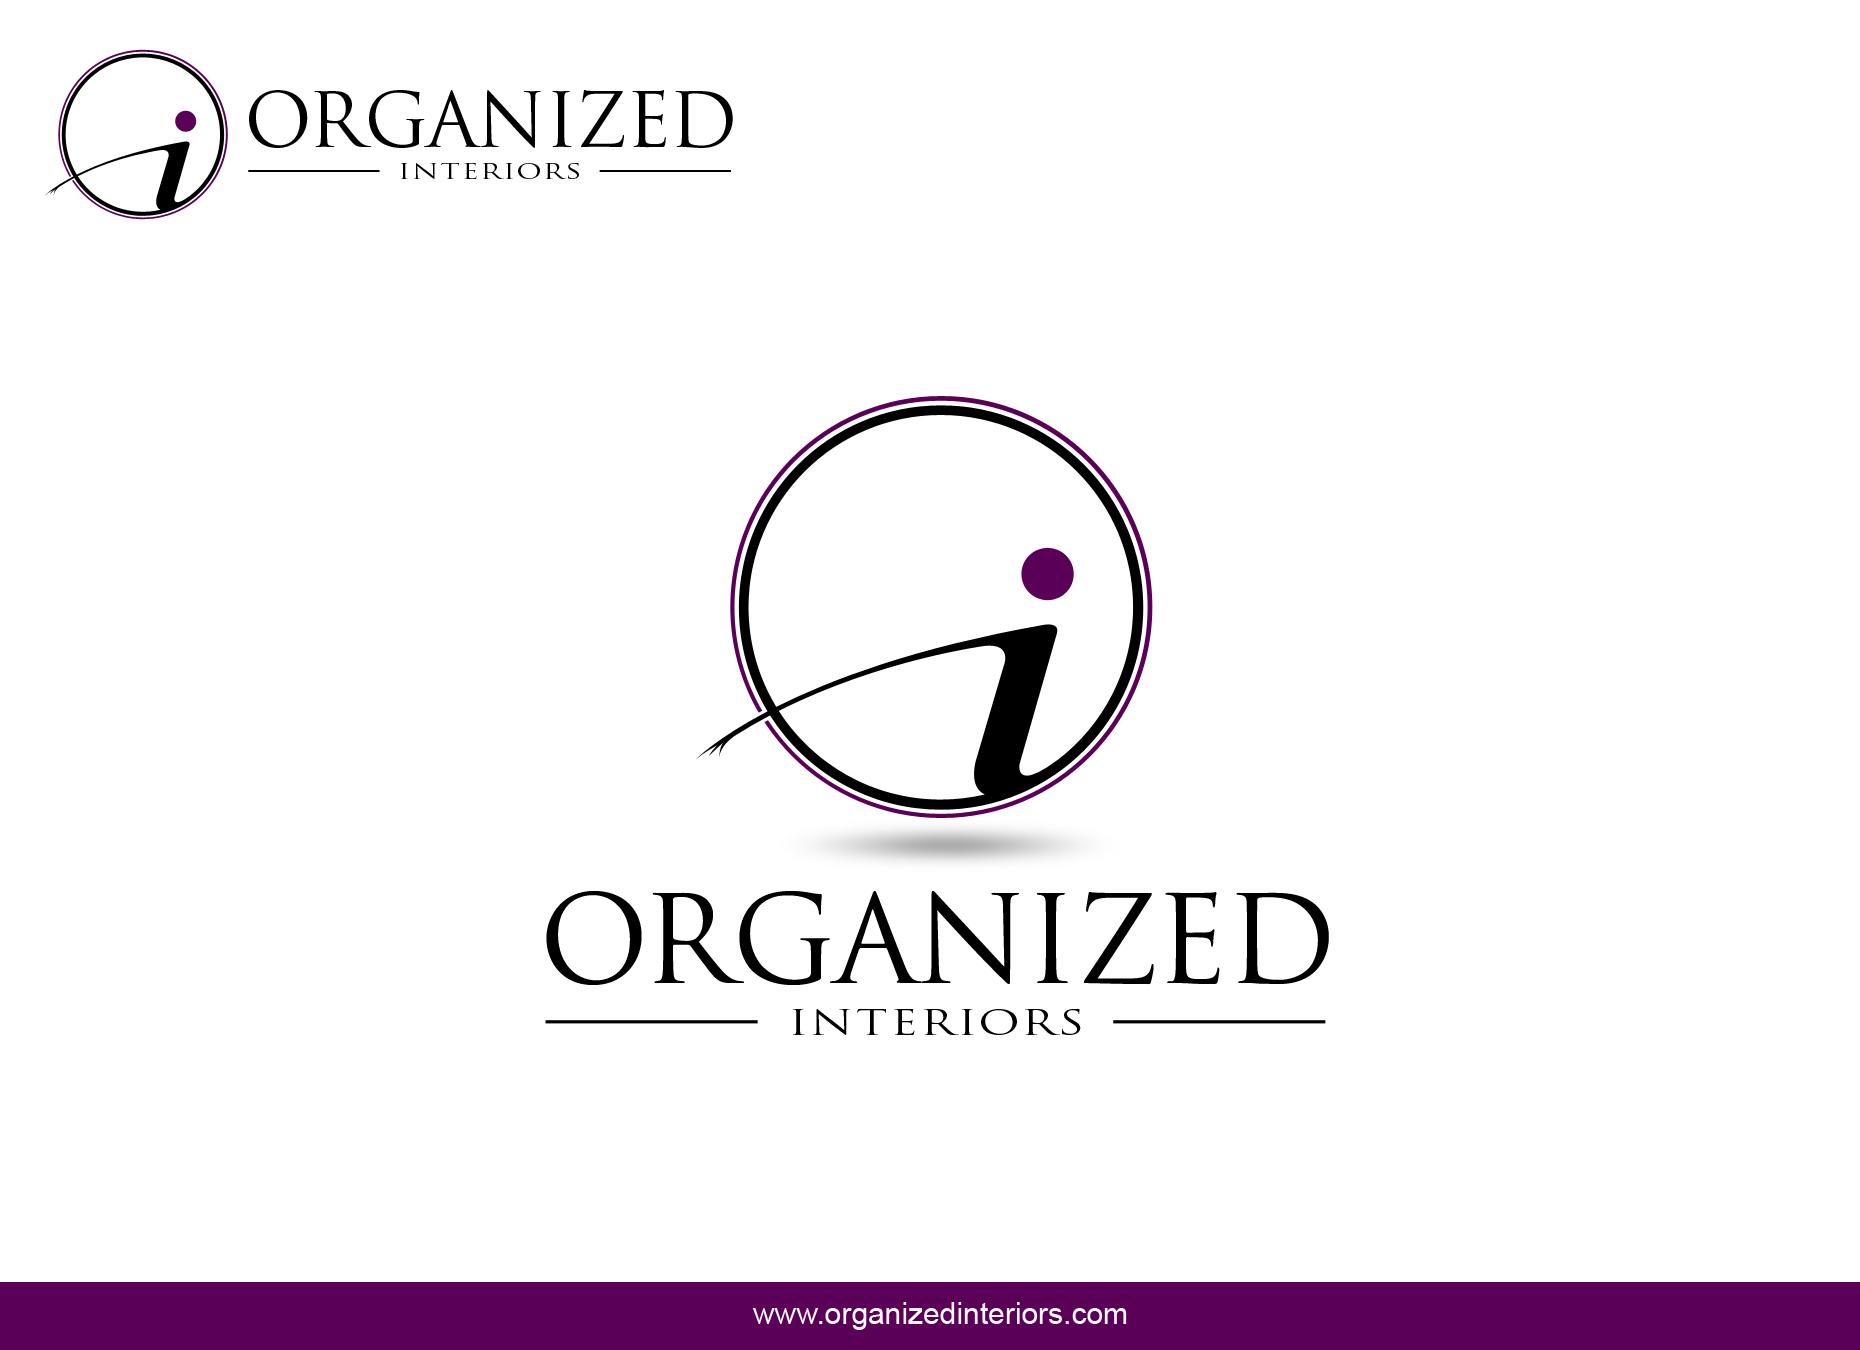 Logo Design by omARTist - Entry No. 135 in the Logo Design Contest Imaginative Logo Design for Organized Interiors.